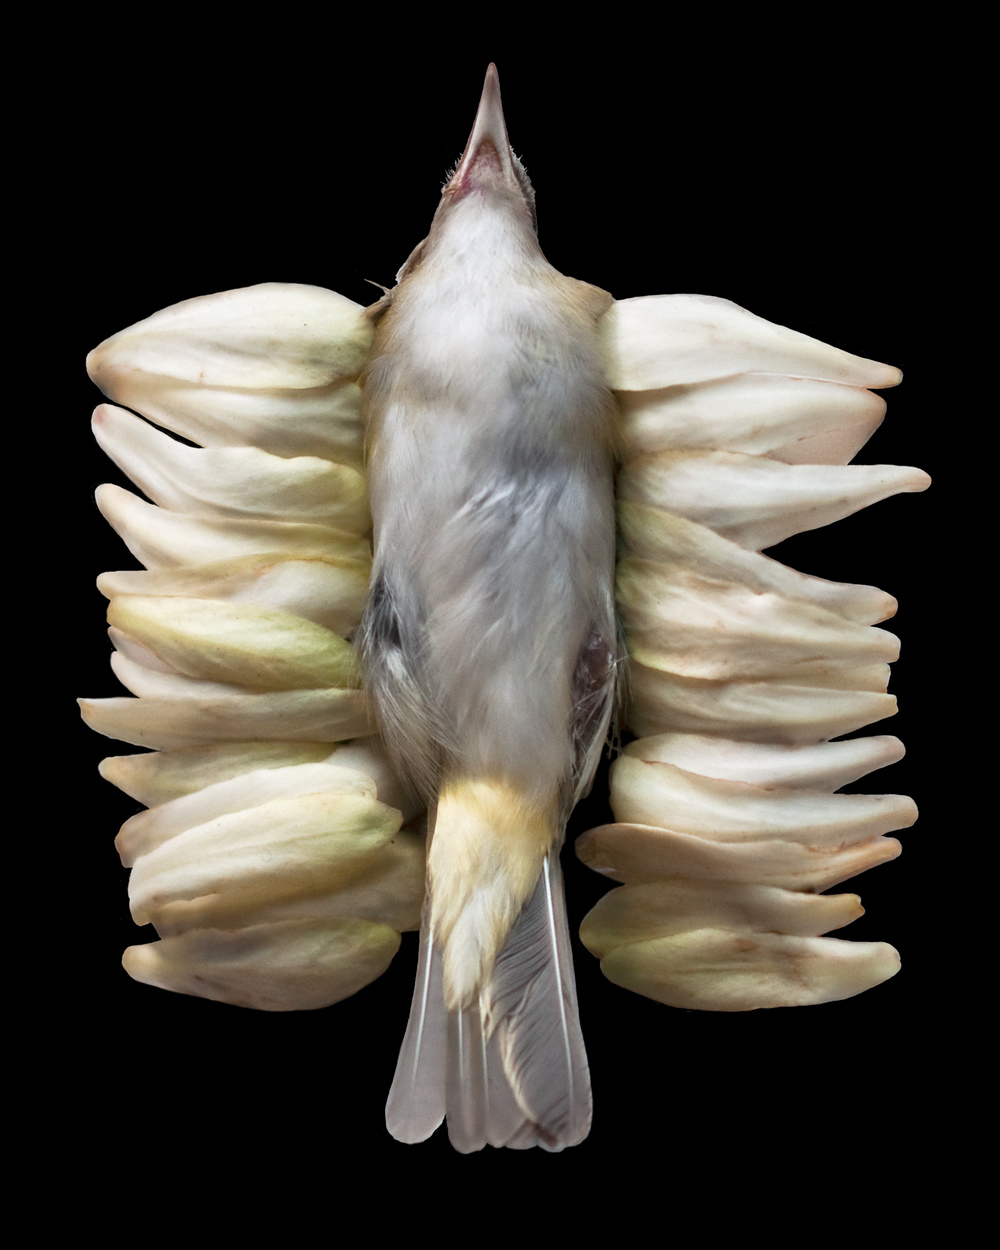 cecilia schmidt